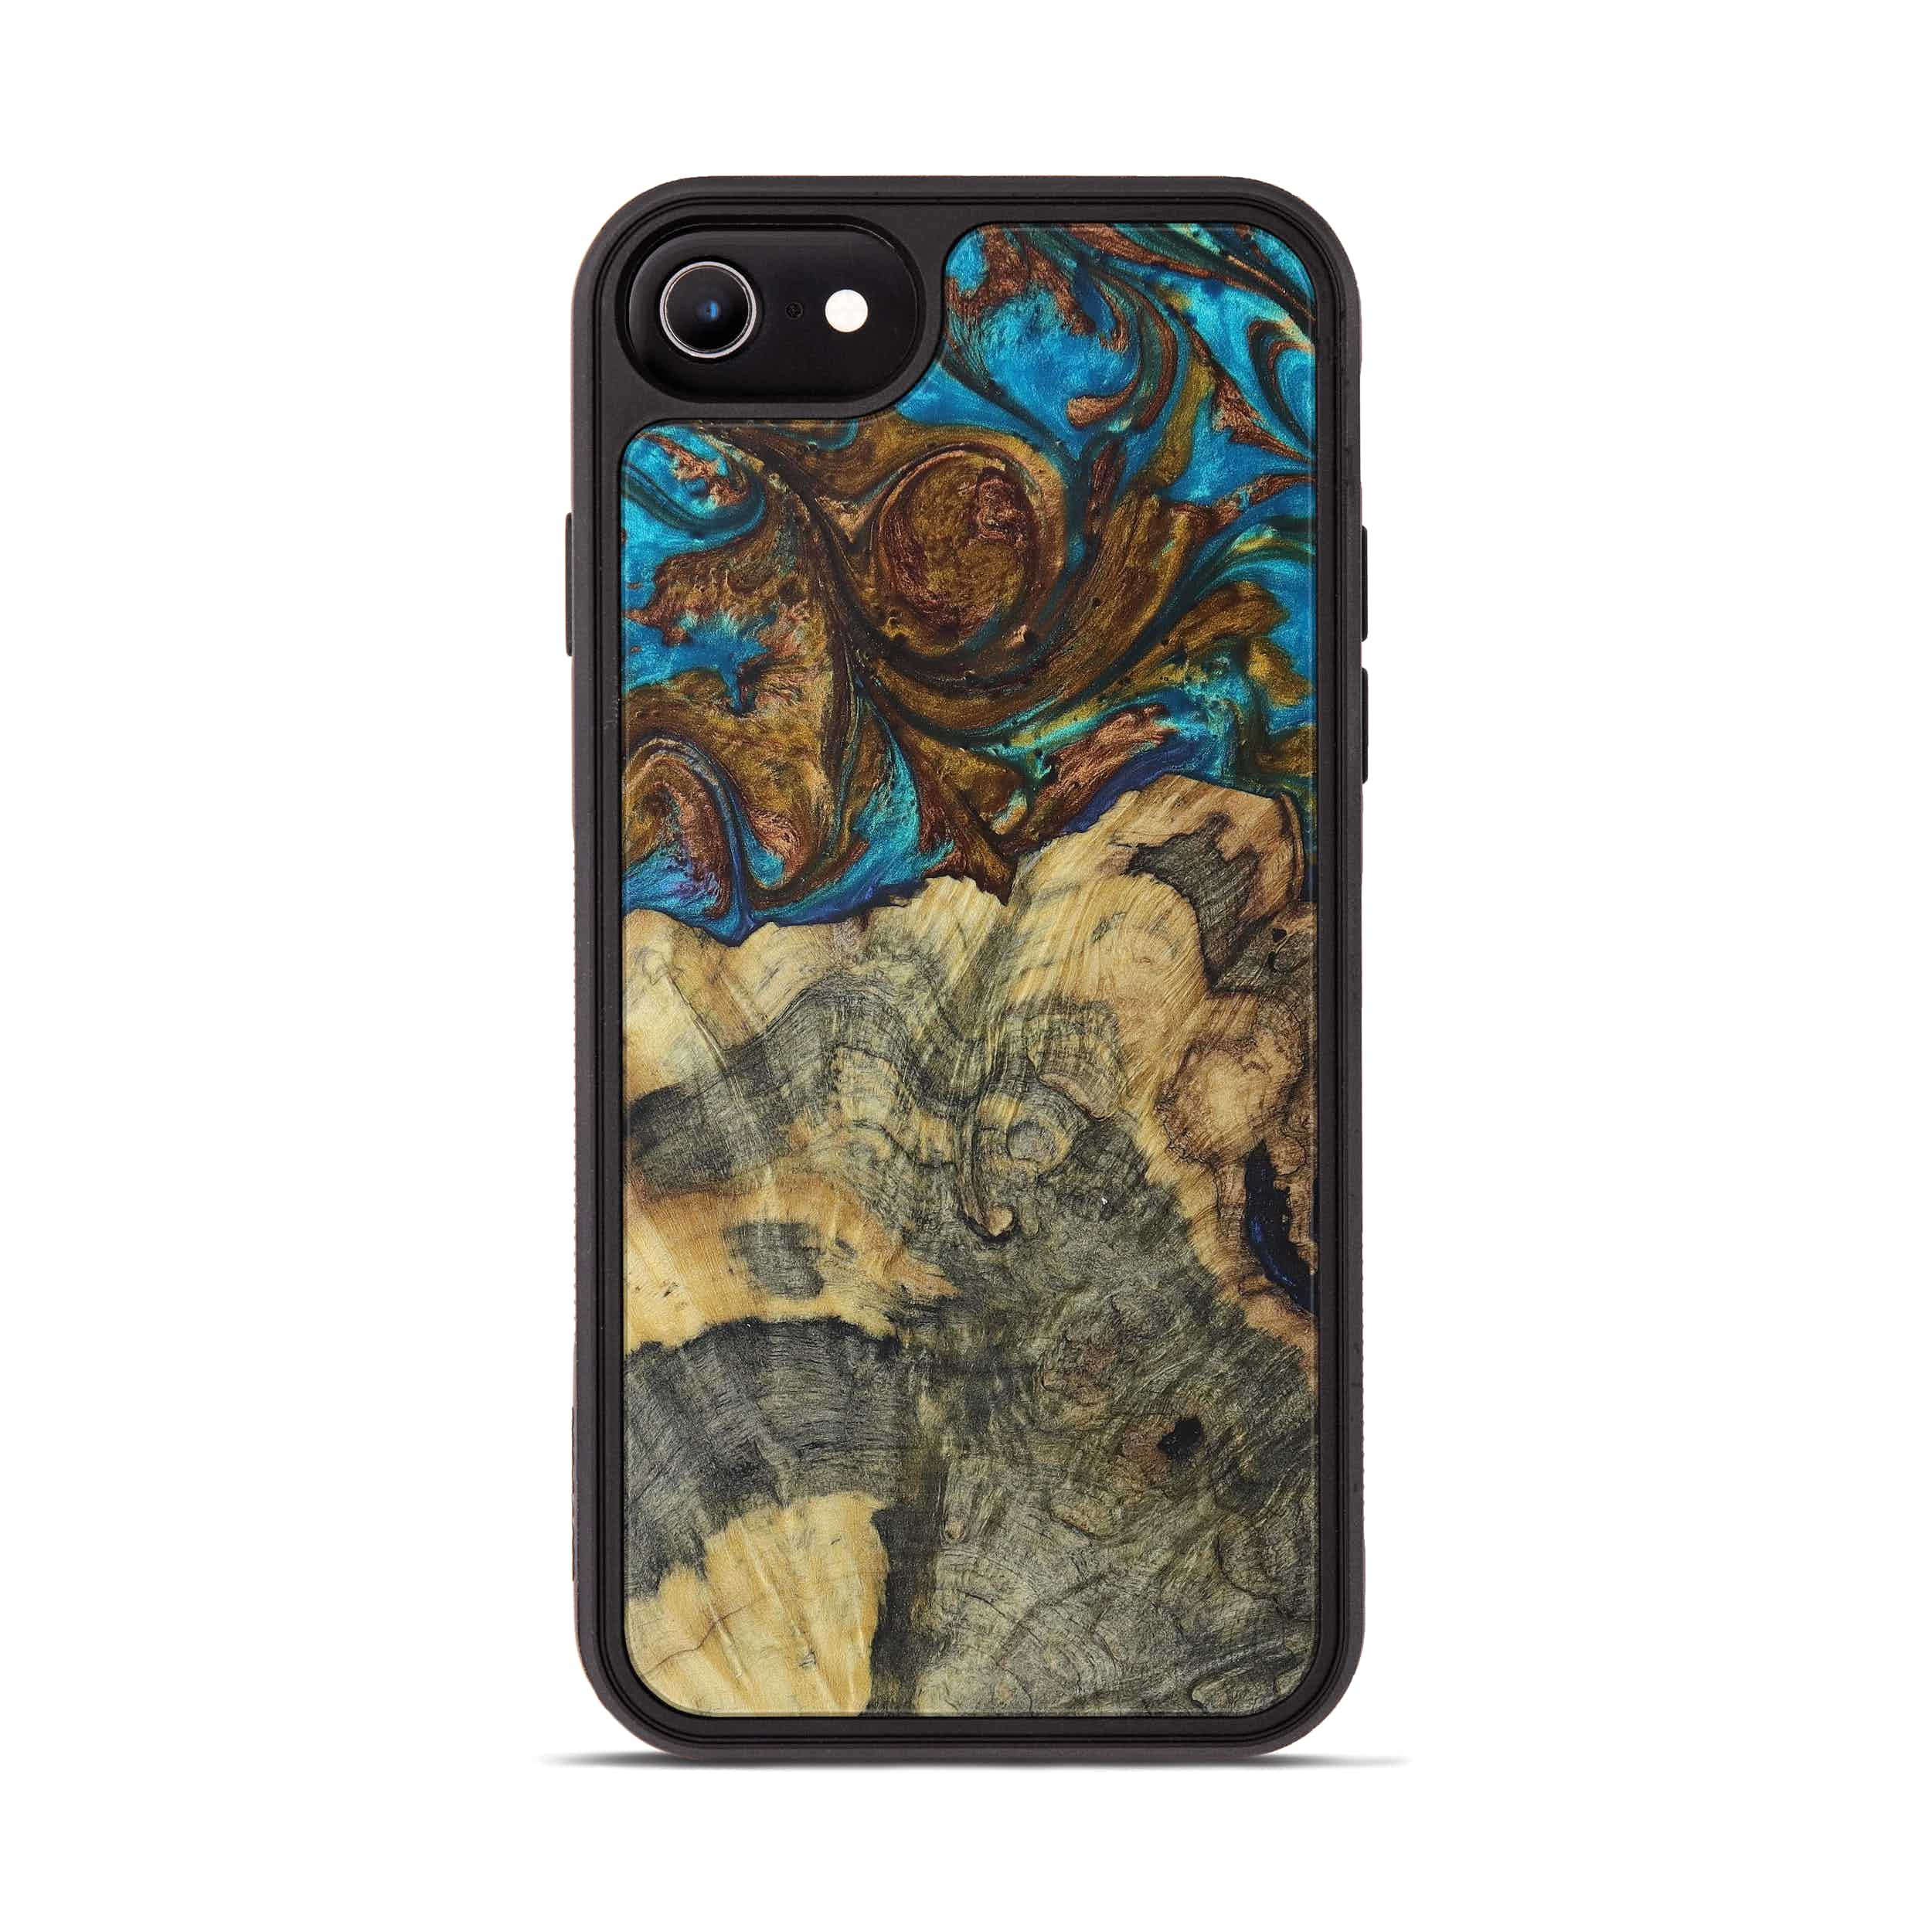 iPhone 6s Wood+Resin Phone Case - Janeta (Teal & Gold, 394240)